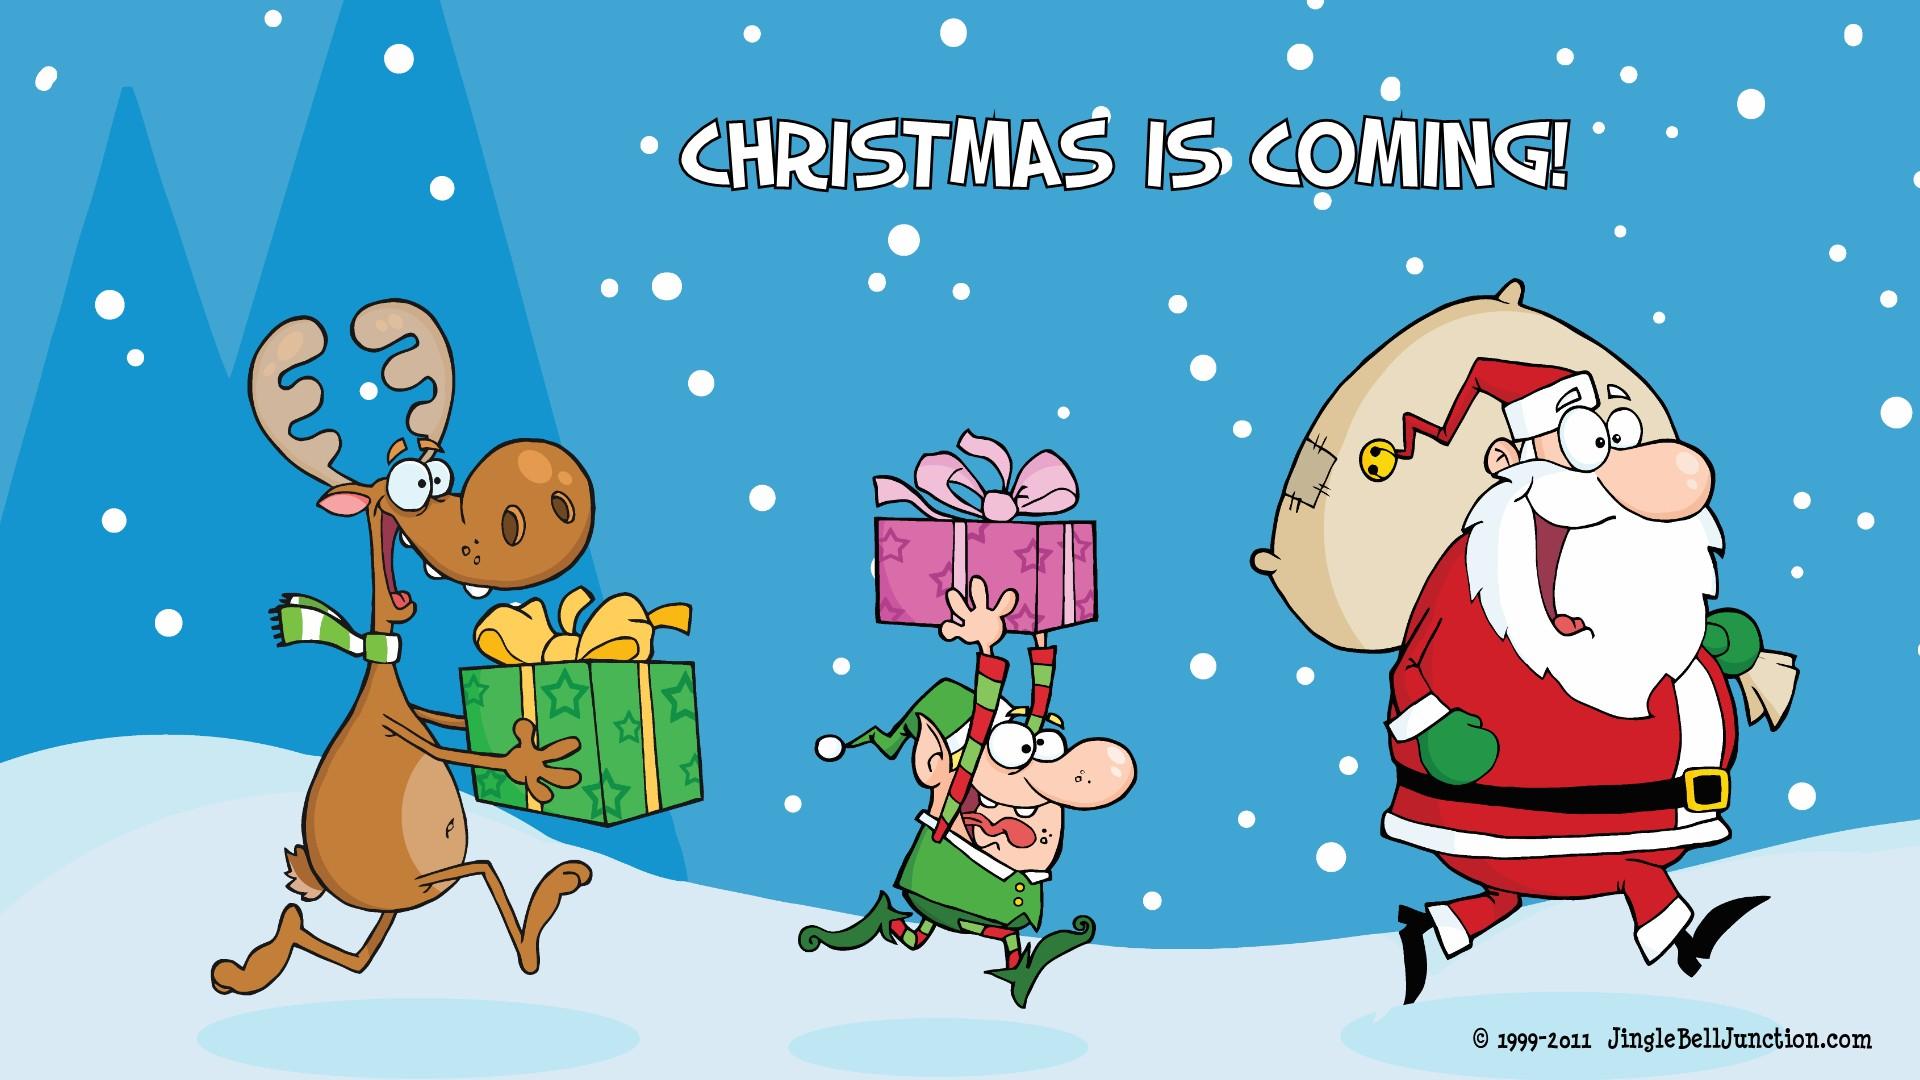 christmas elf wallpaper christmas elf wallpaper christmas elf 1920x1080